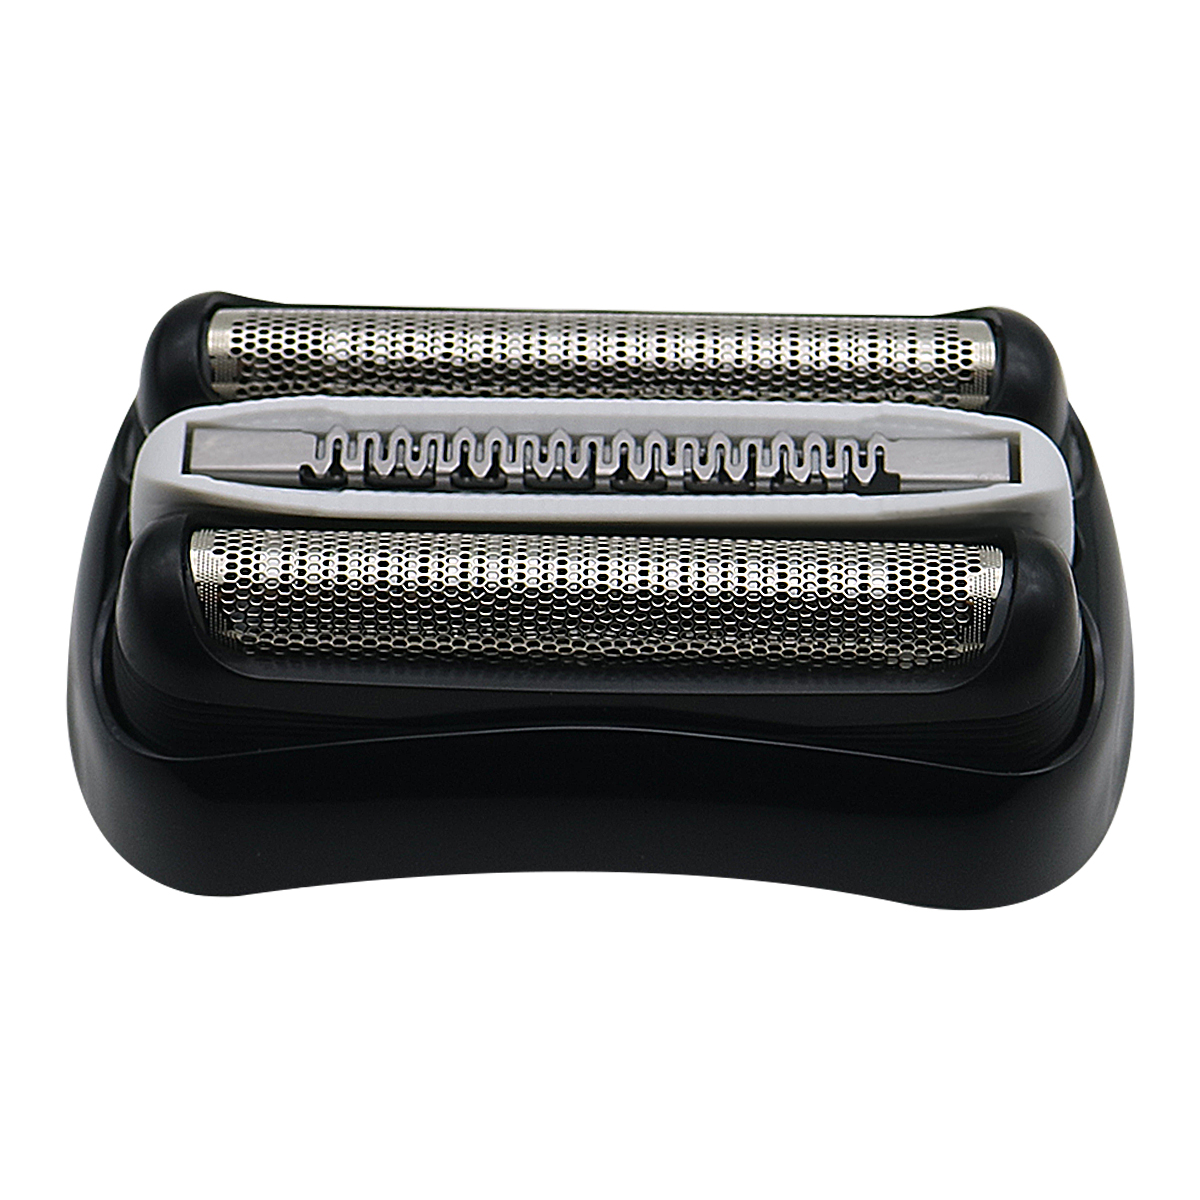 32b para braun series 3 cabeça de barbear elétrico 320 330 340 350 380 300s 301s 310s 3000s 3010s 3020s 330s-4 3050cc 3040s